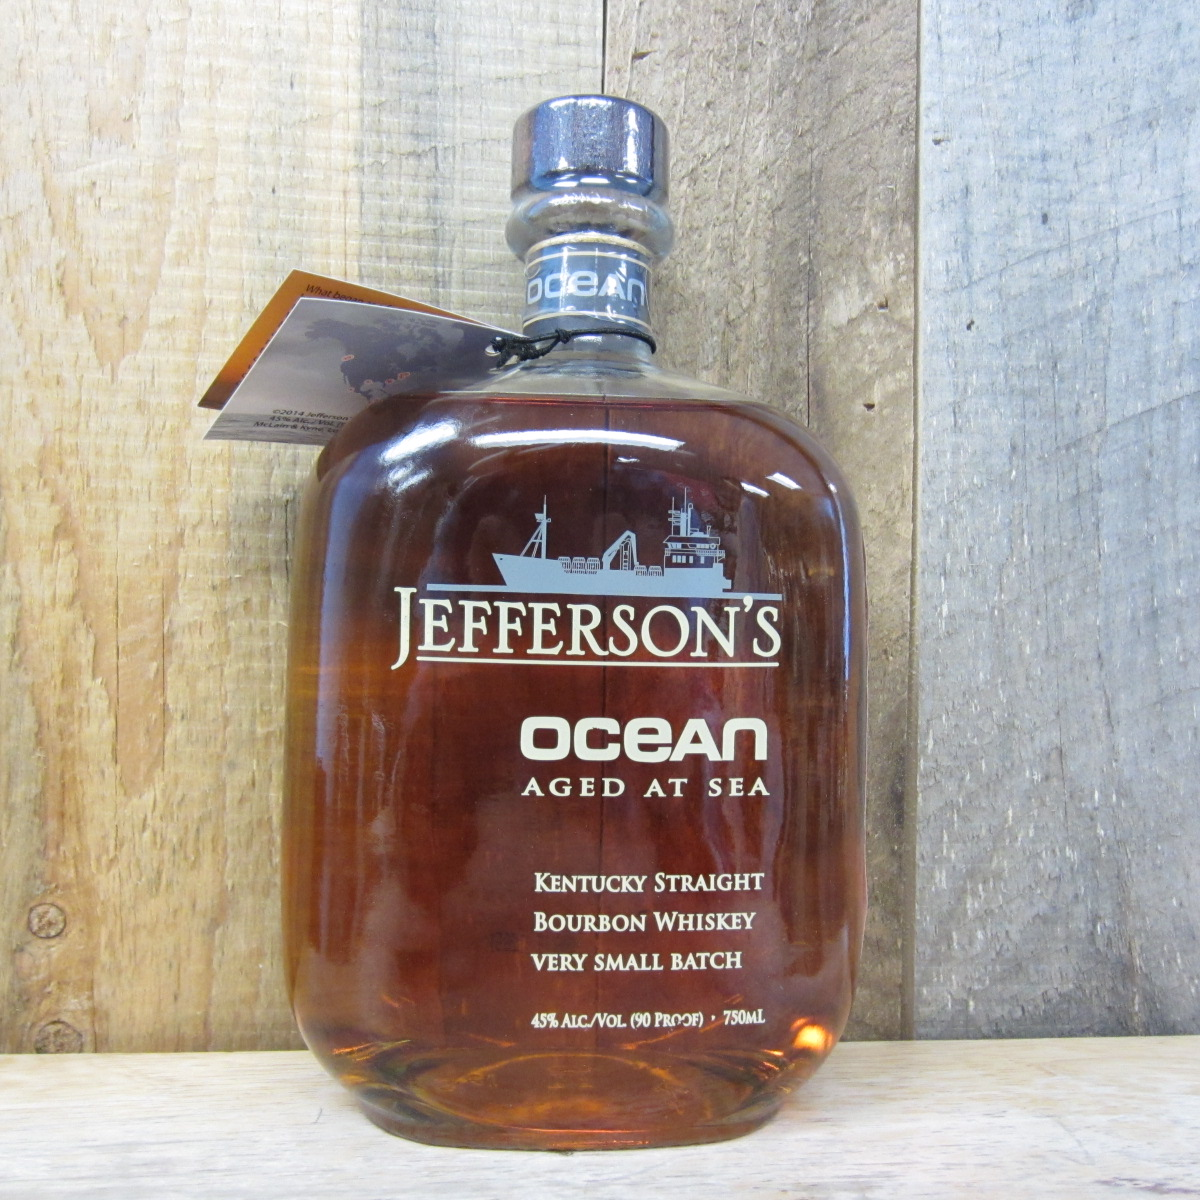 JEFFERSONS BOURBON OCEAN AGED AT SEA VOYAGE 16 750ML